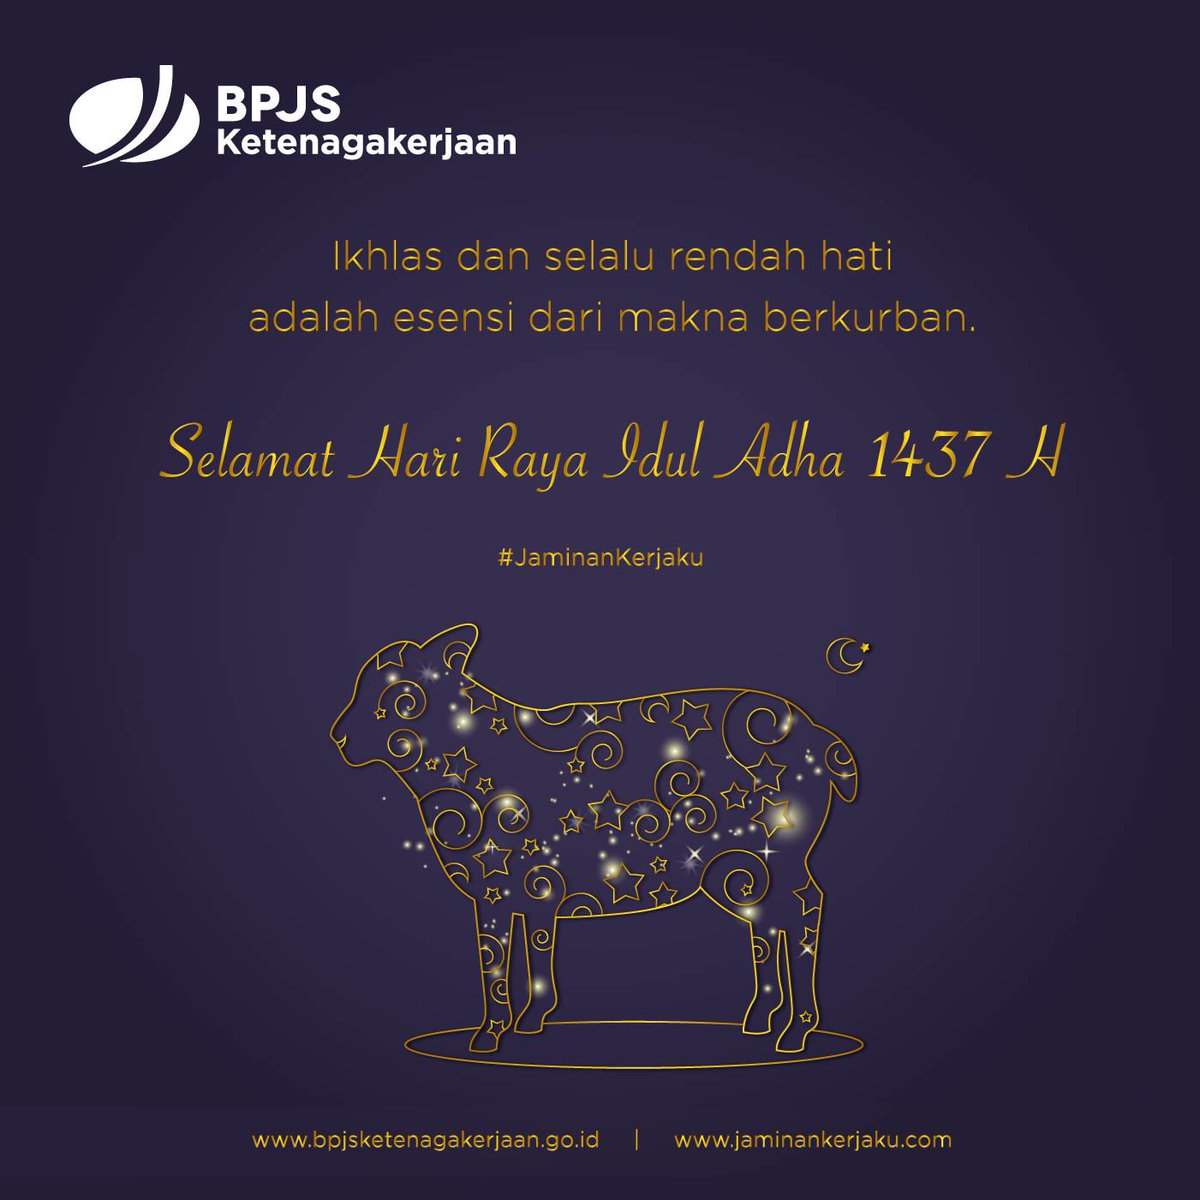 Bpjs Ketenagakerjaan در توییتر Ikhlas Dan Selalu Rendah Hati Adalah Esensi Dari Makna Berkurban Selamat Hari Raya Idul Adha 1437 H